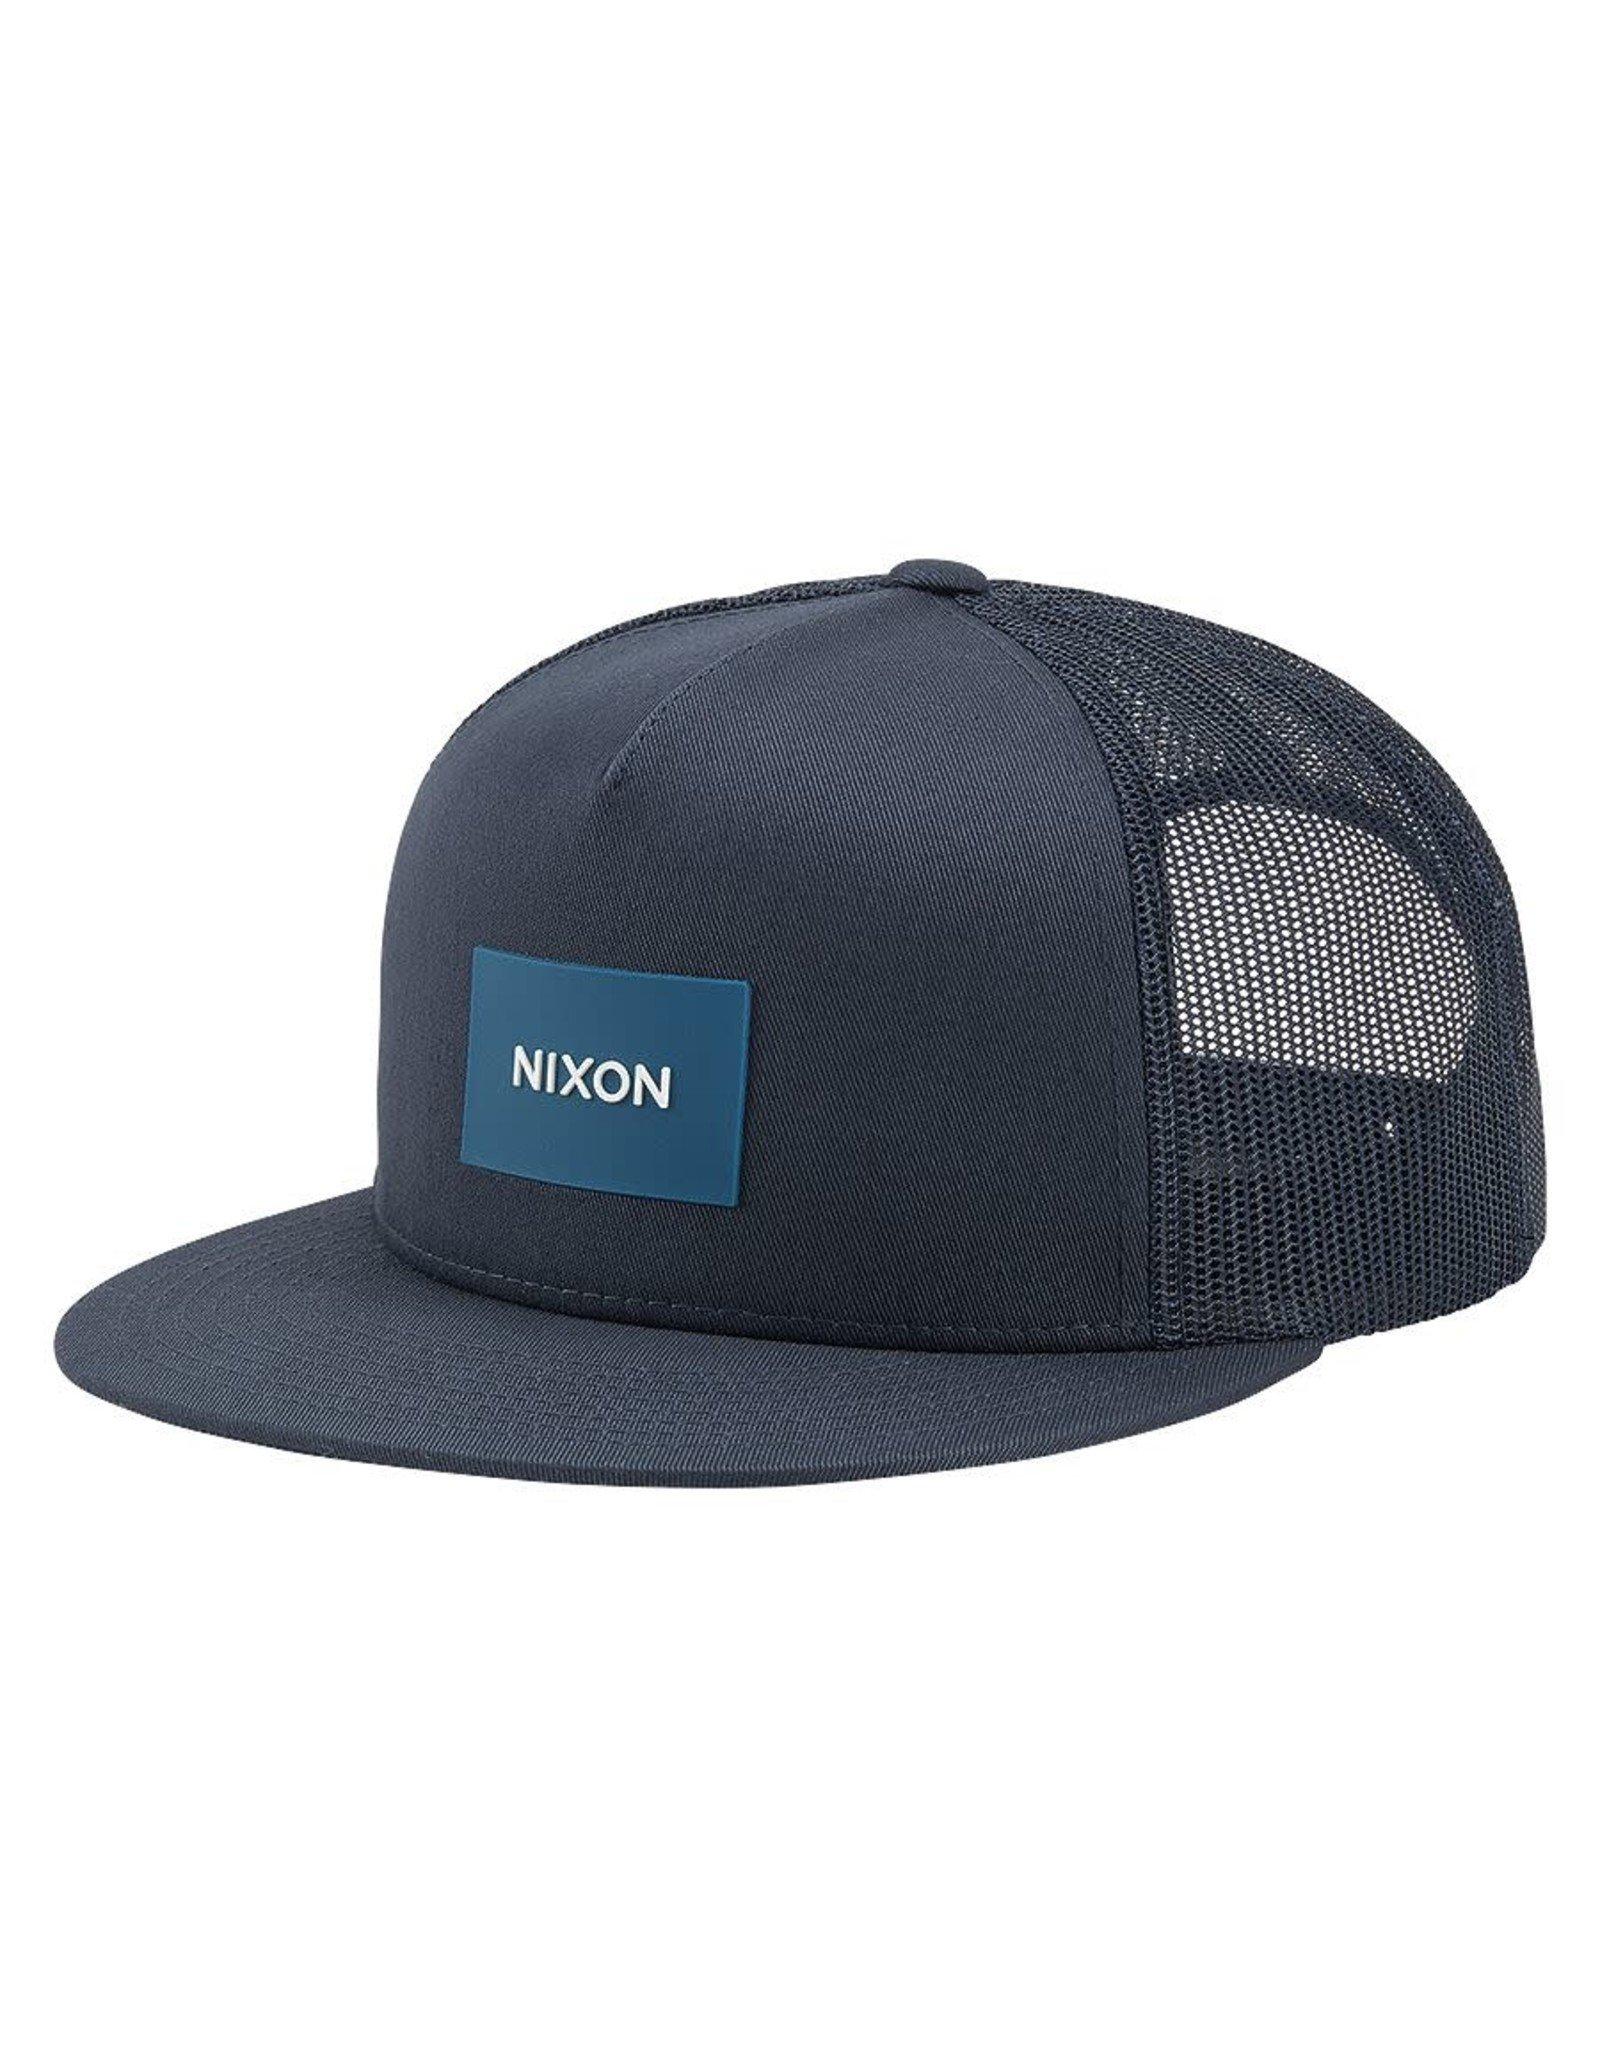 NIXON Team Trucker Hat, NAVY